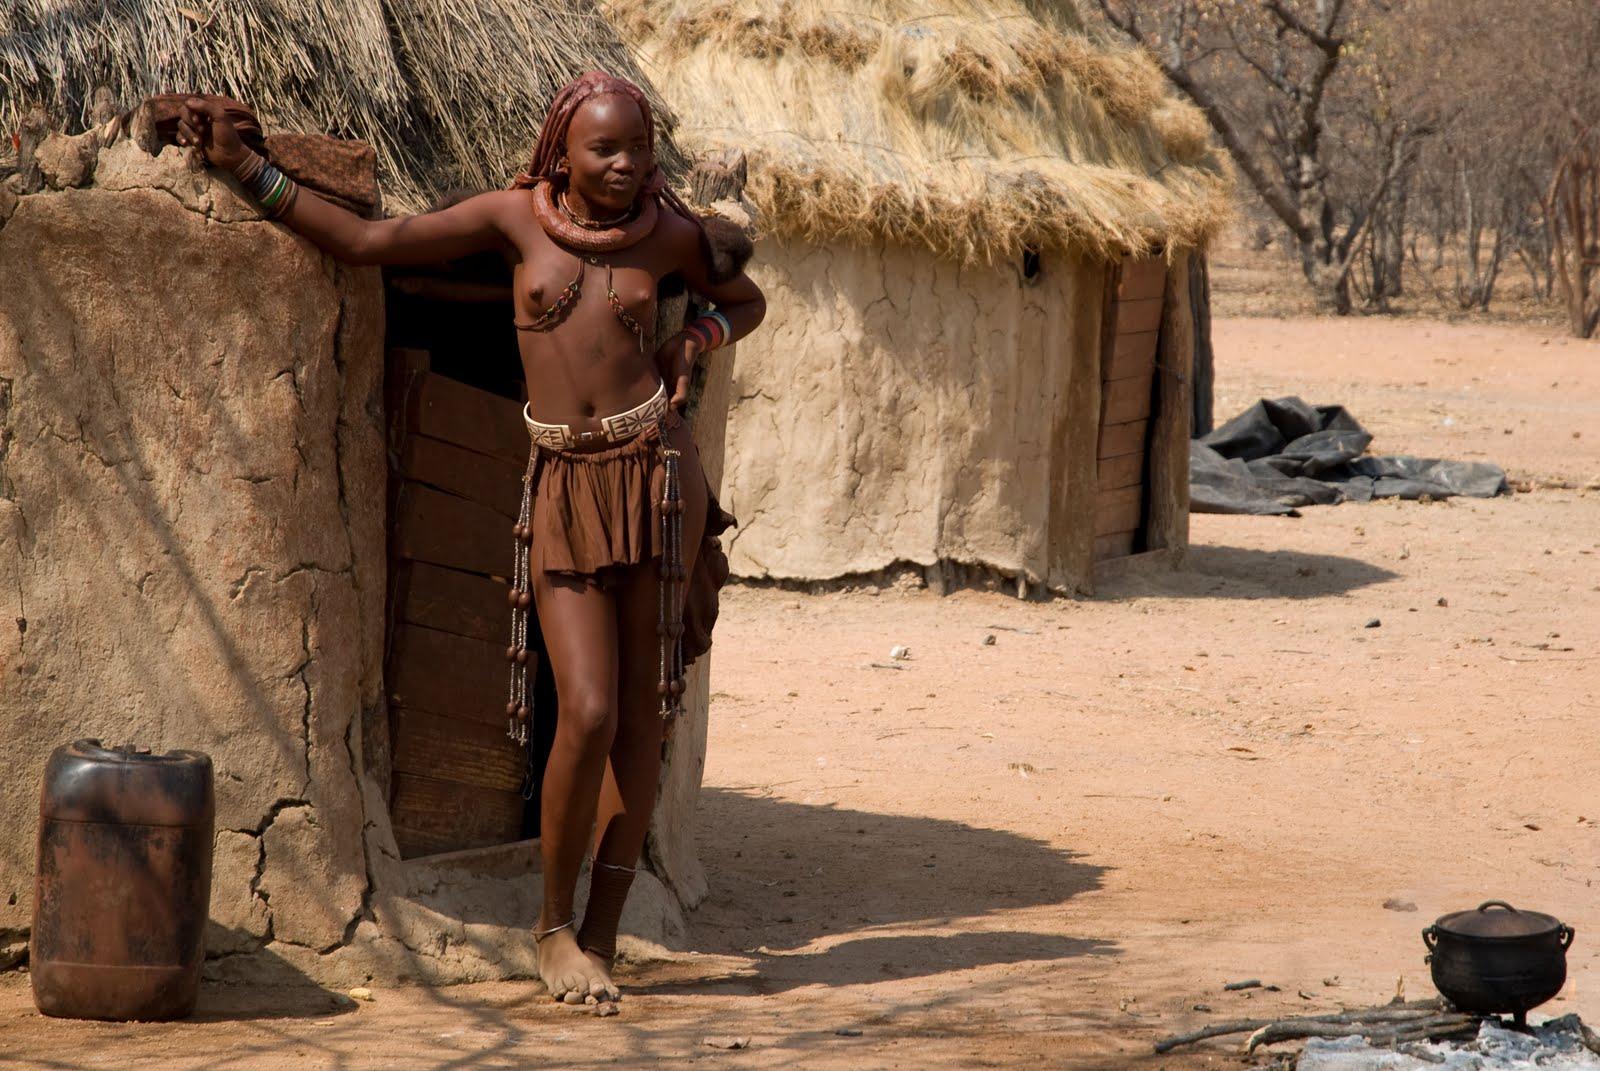 onlayn-film-seks-dikih-plemen